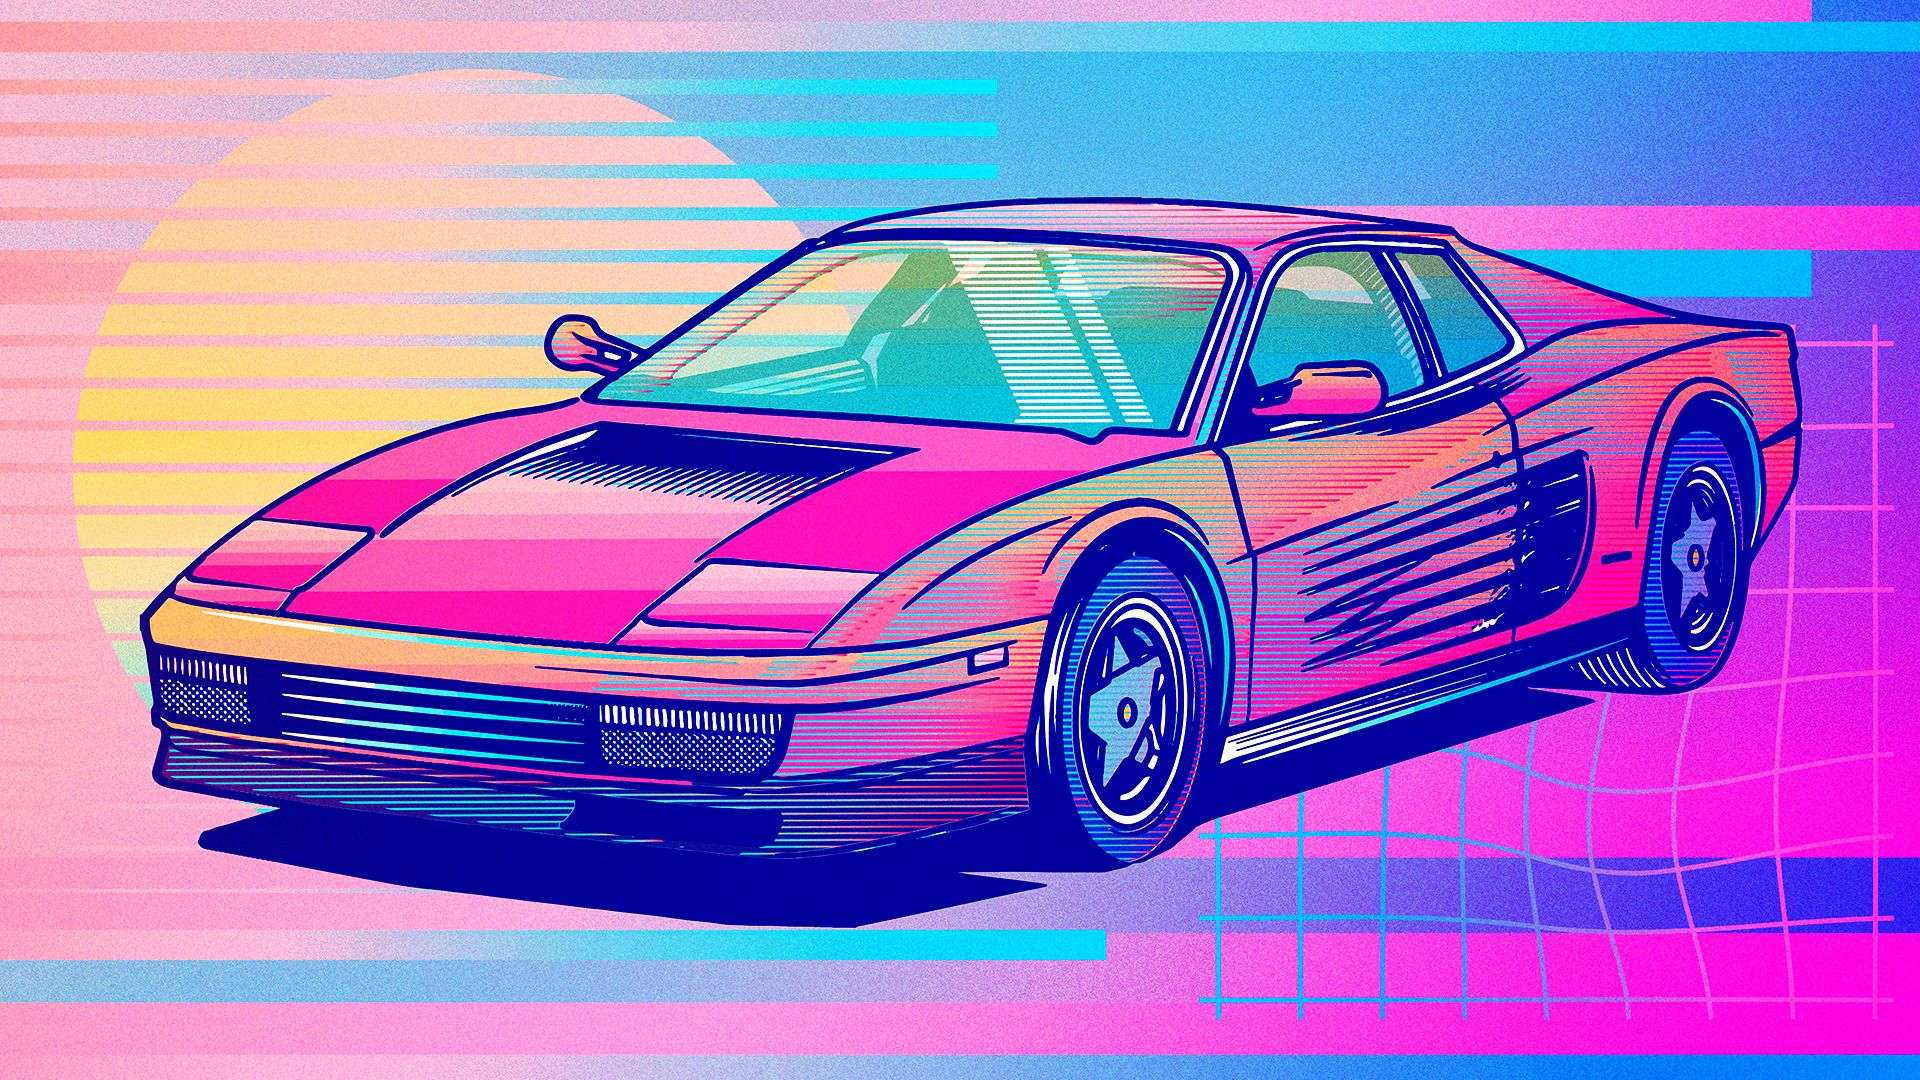 Synthwave Vaporwave Ferrari Testarossa 1980s Pop Up Headlights 1920x1080